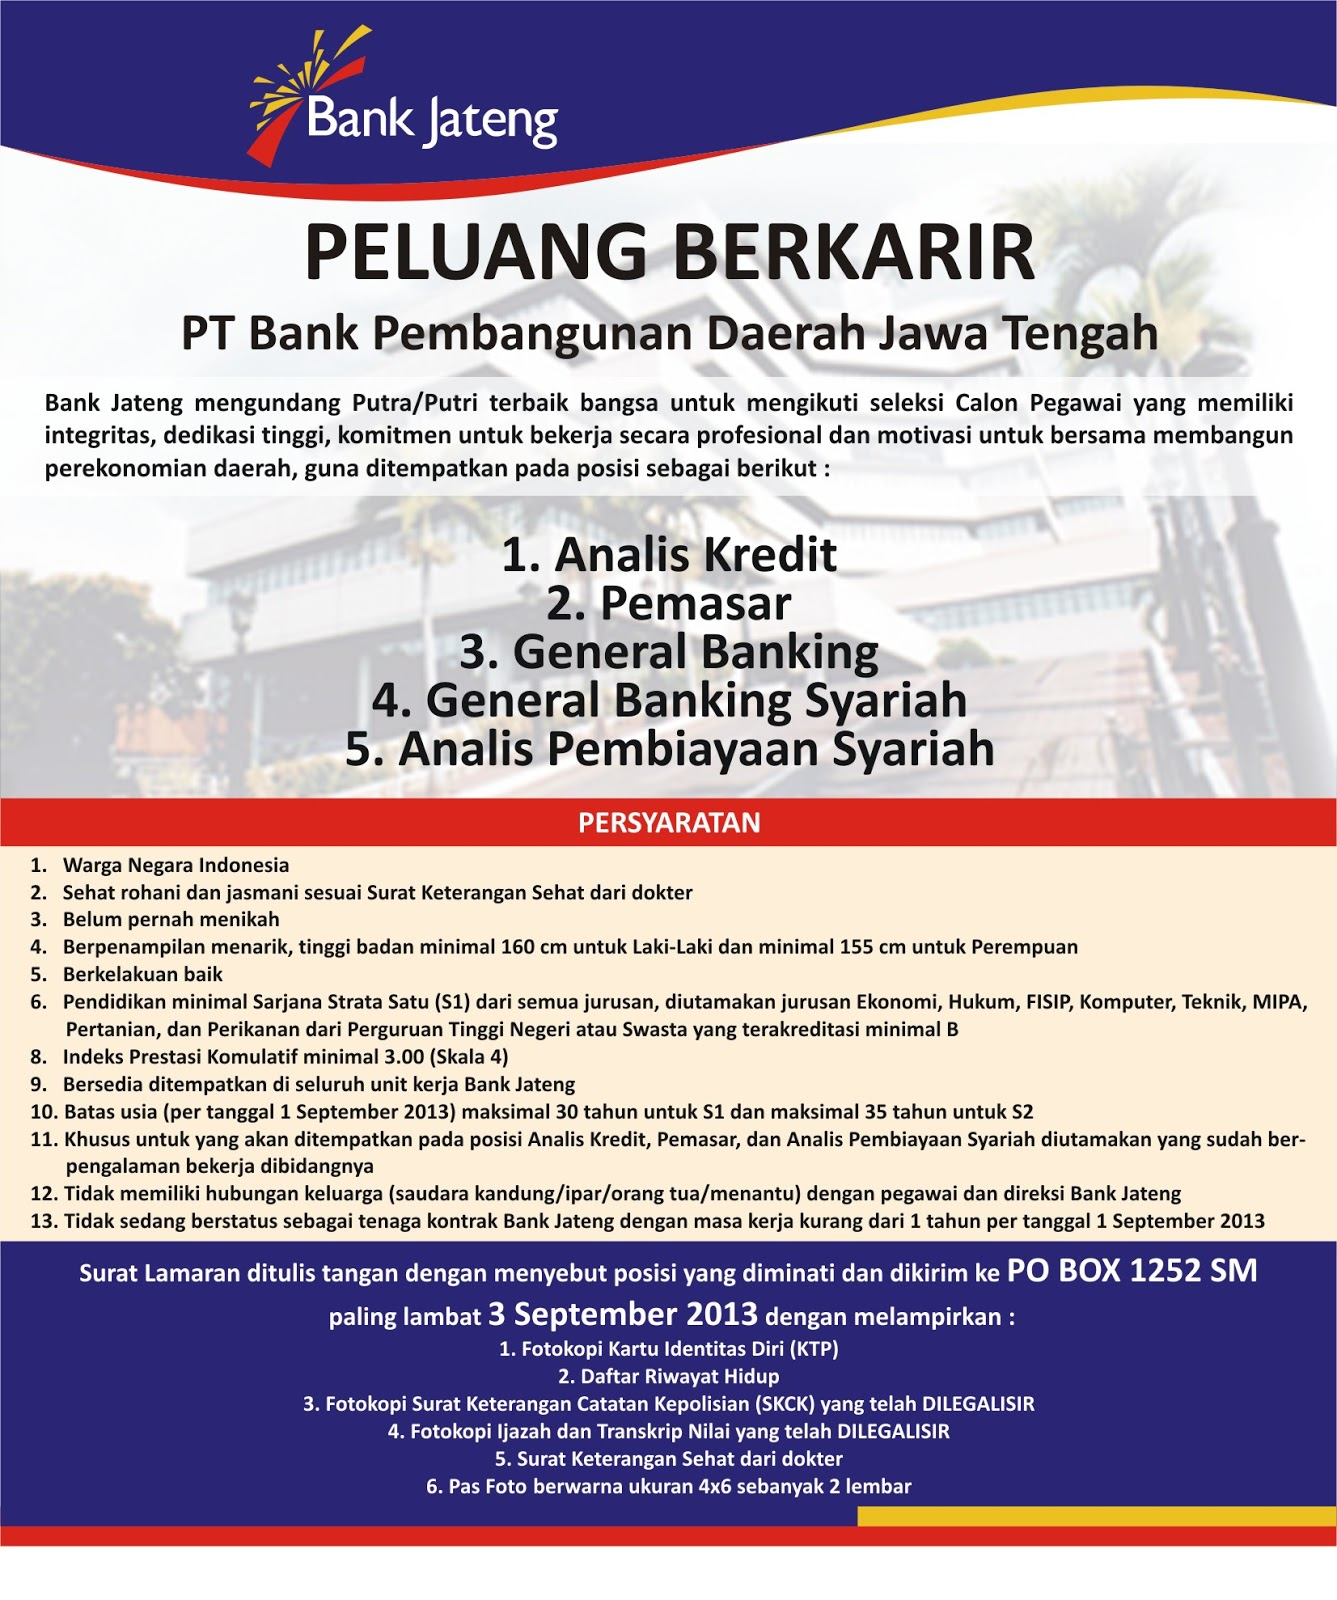 Loker Di Bpd Di Semarang Informasi Lowongan Kerja Loker Terbaru 2016 2017 Ect Lowongan Pekerjaan Bpd Jawa Tengah Maksimal 03 September 2013